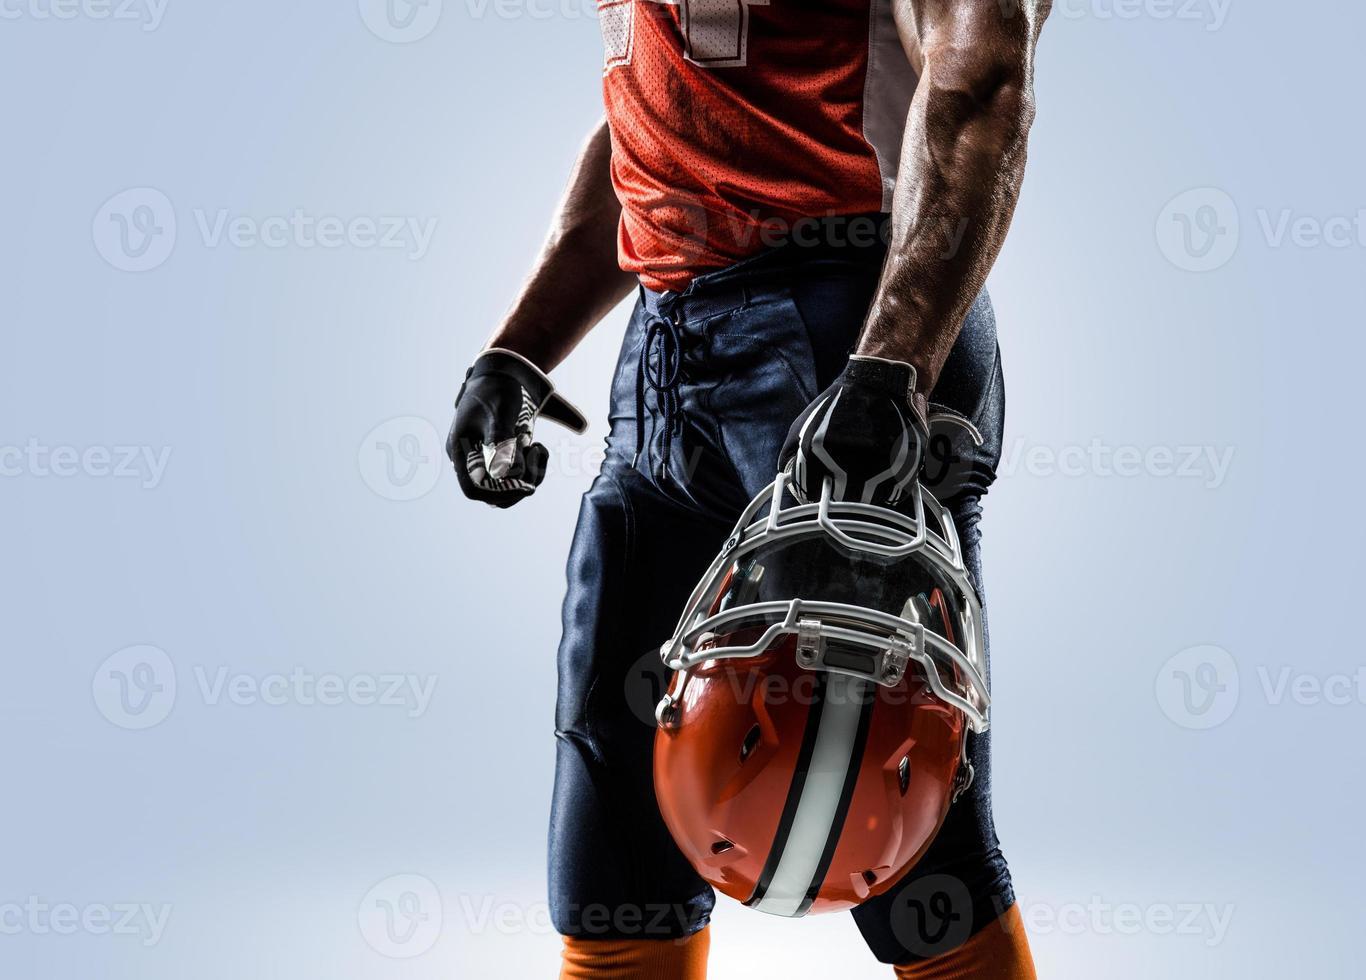 American-Football-Spieler in Aktion weiß isoliert foto